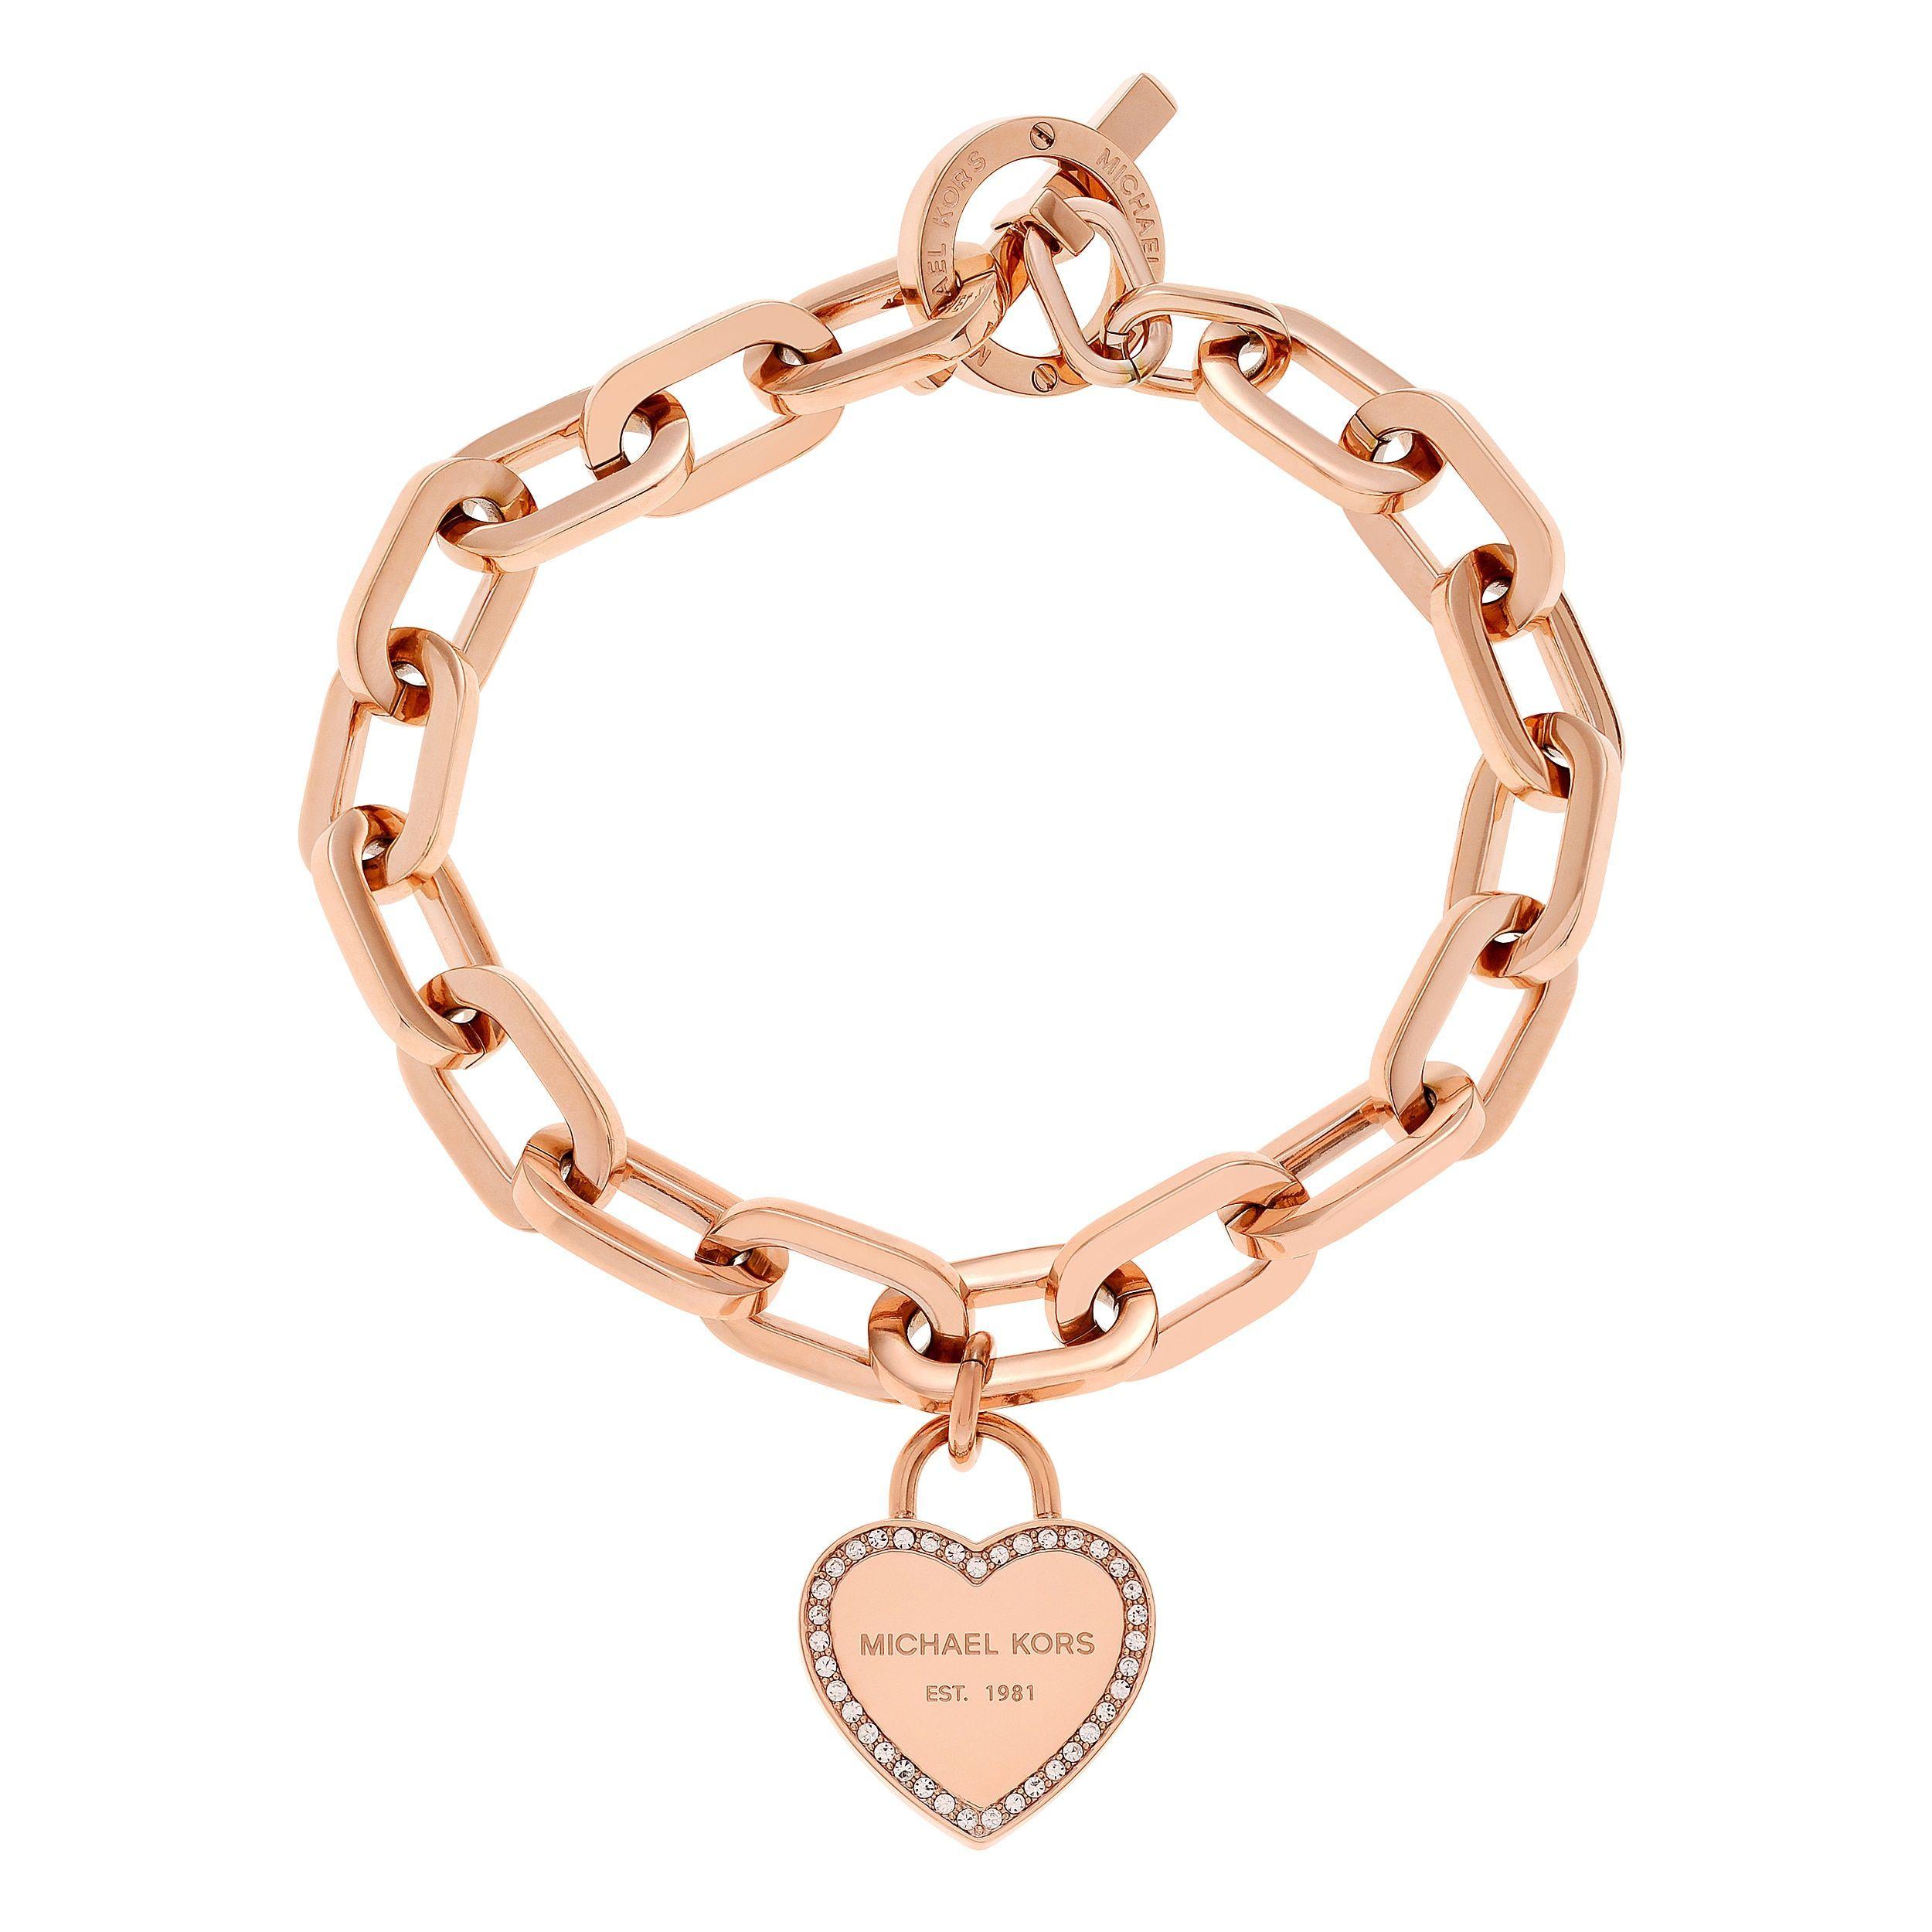 4b892d9c6242 Michael Kors Rose Goldtone Stainless Steel Crystal Pave Logo Heart Charm  Toggle Bracelet (Rose Gold)